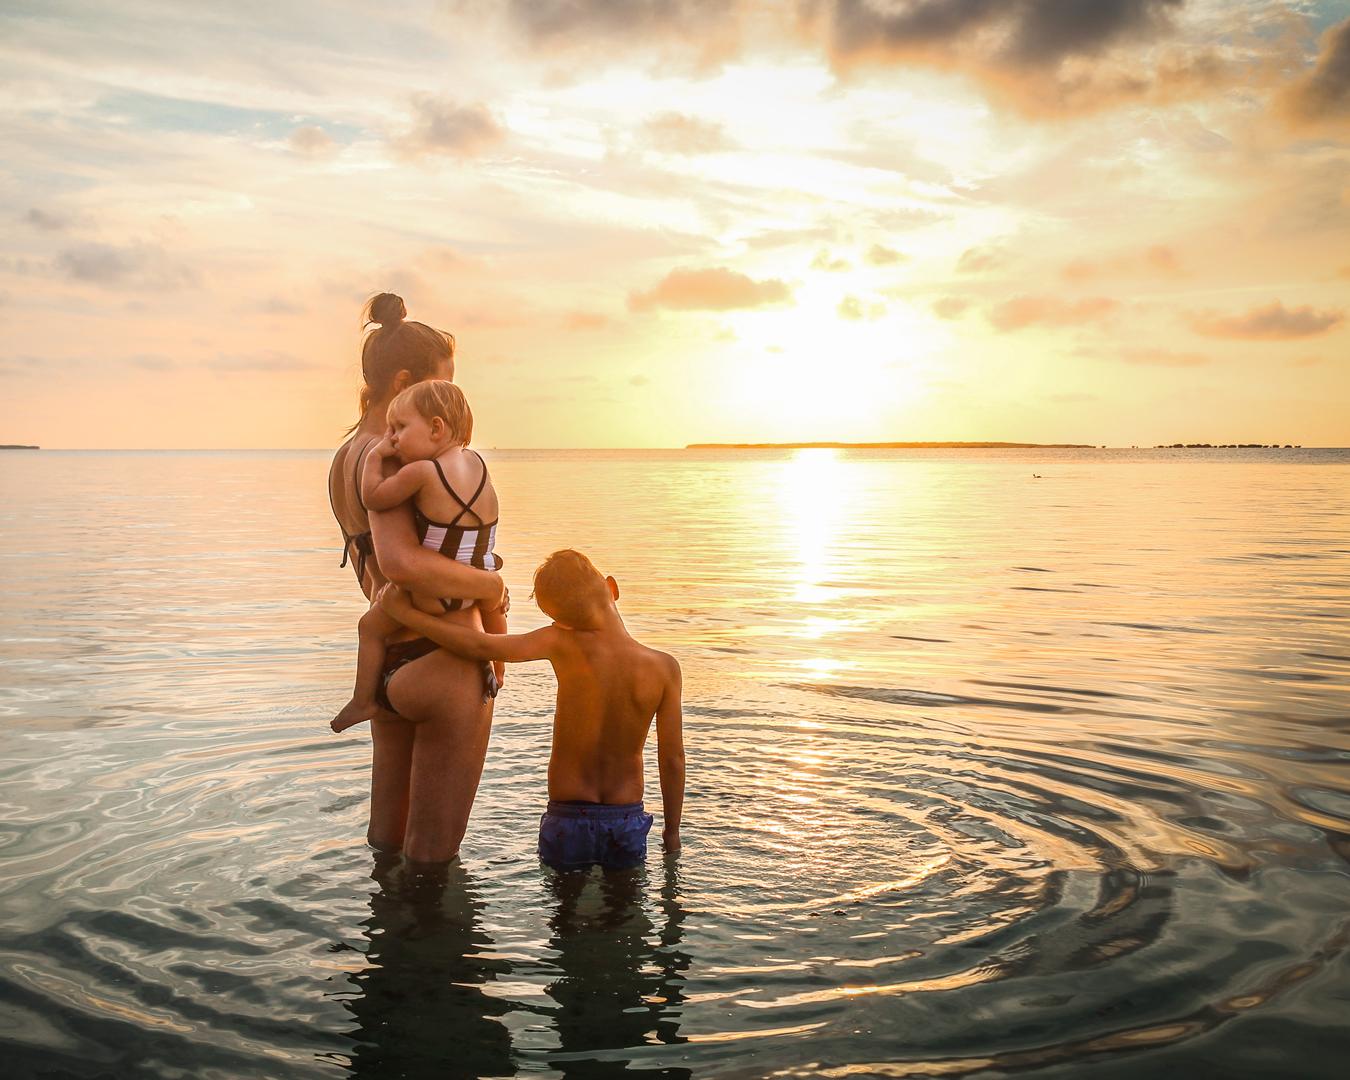 Delano_Miami_south_beach_reizen_met_kinderen-9.jpg